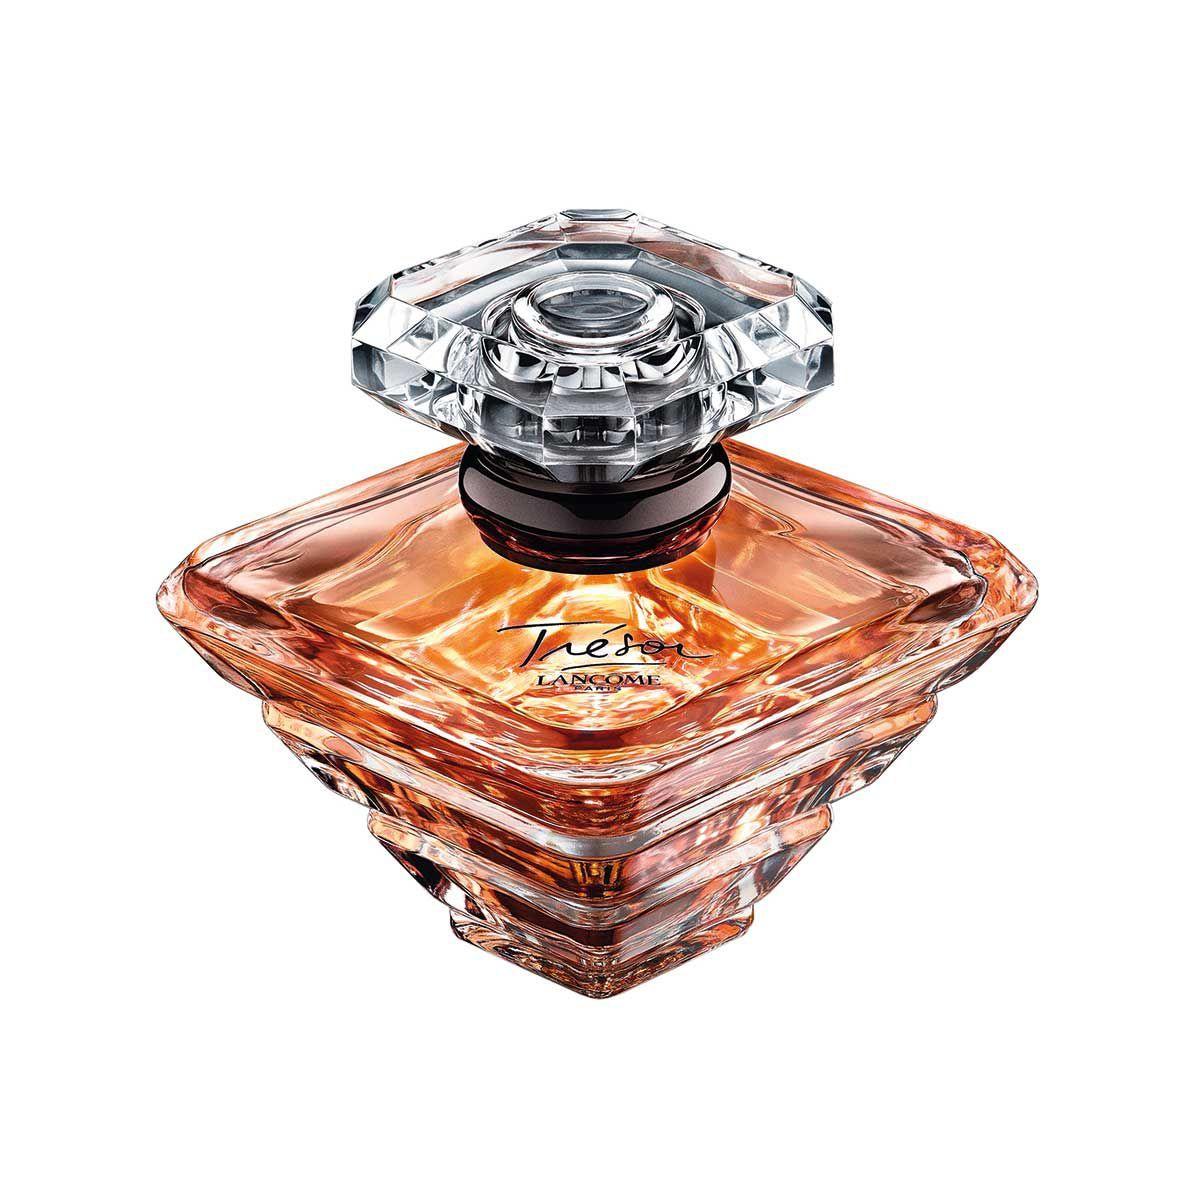 Lancôme Trésor (Eau de Parfum) 100 ml - 59,99 bei Abholung bzw. 64,94 inkl. Versand